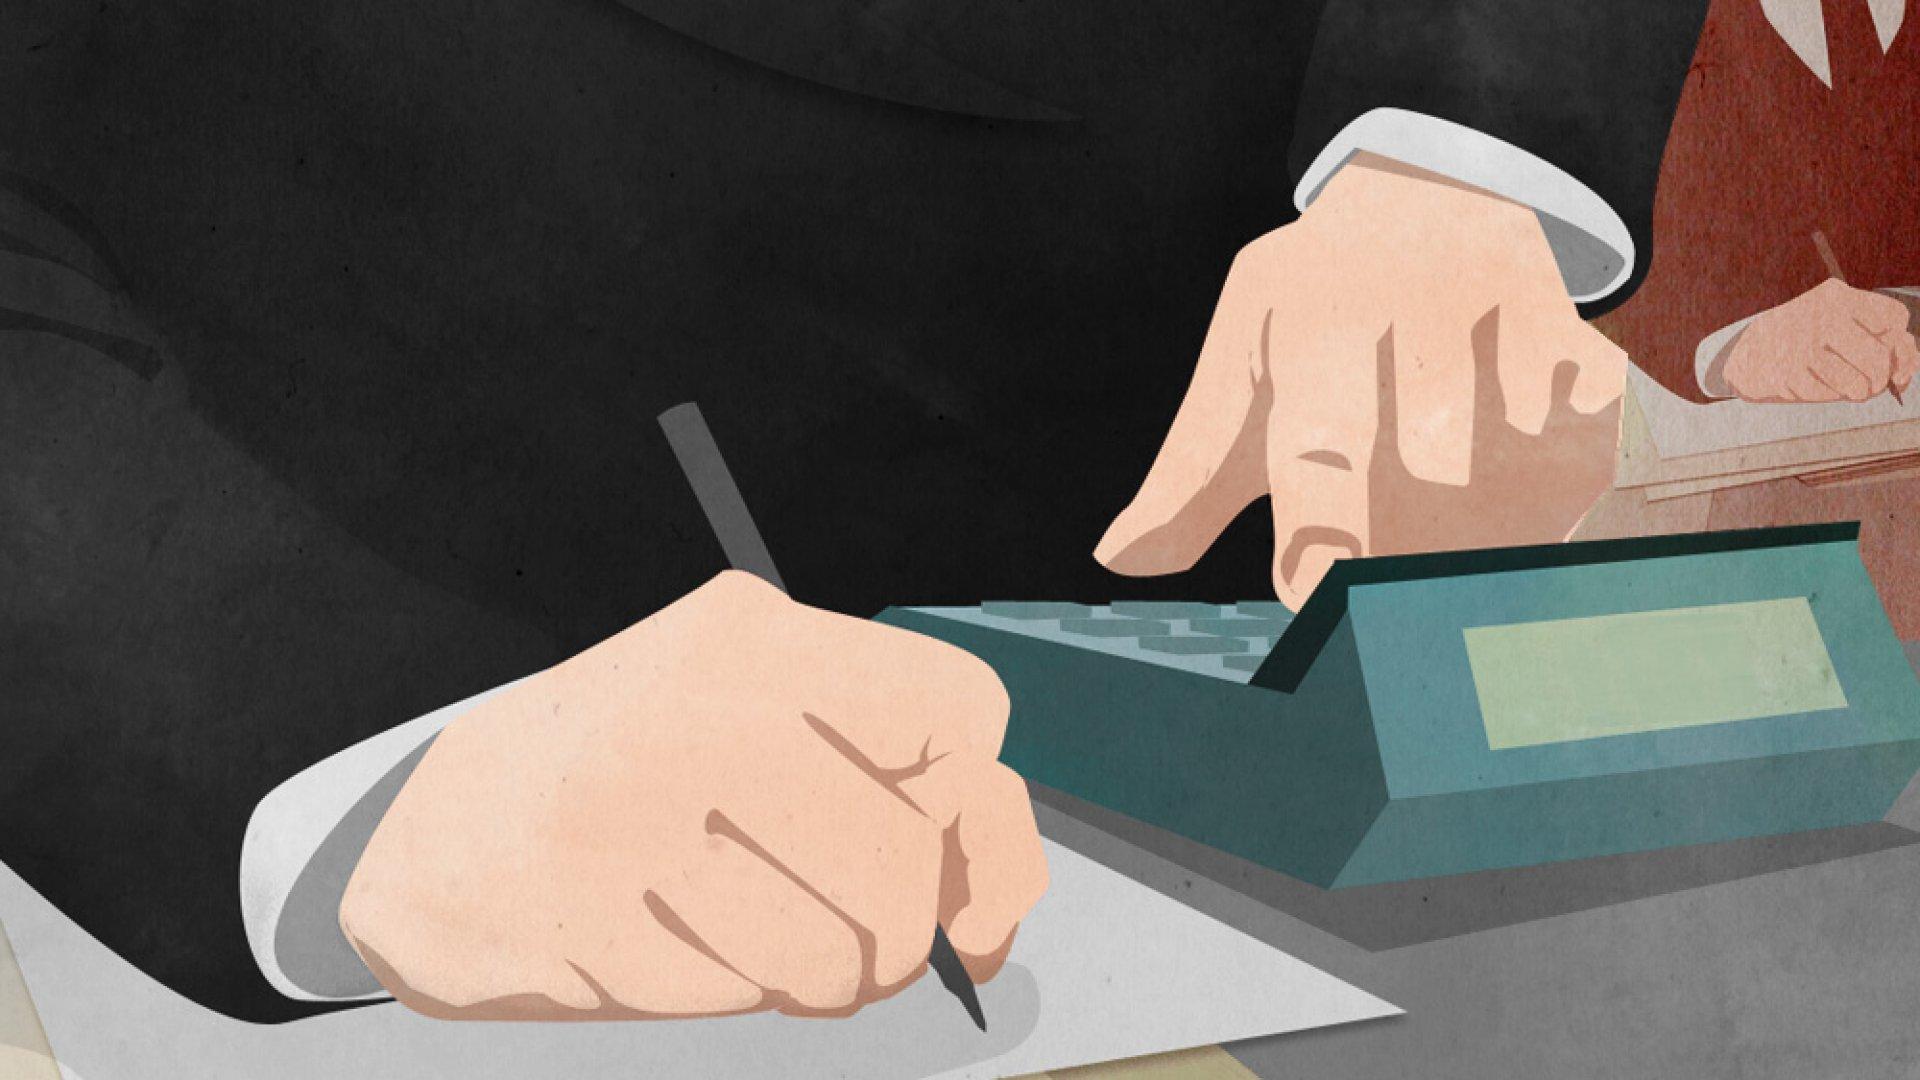 3 Ways to Grow Your Cash Flow With Debt